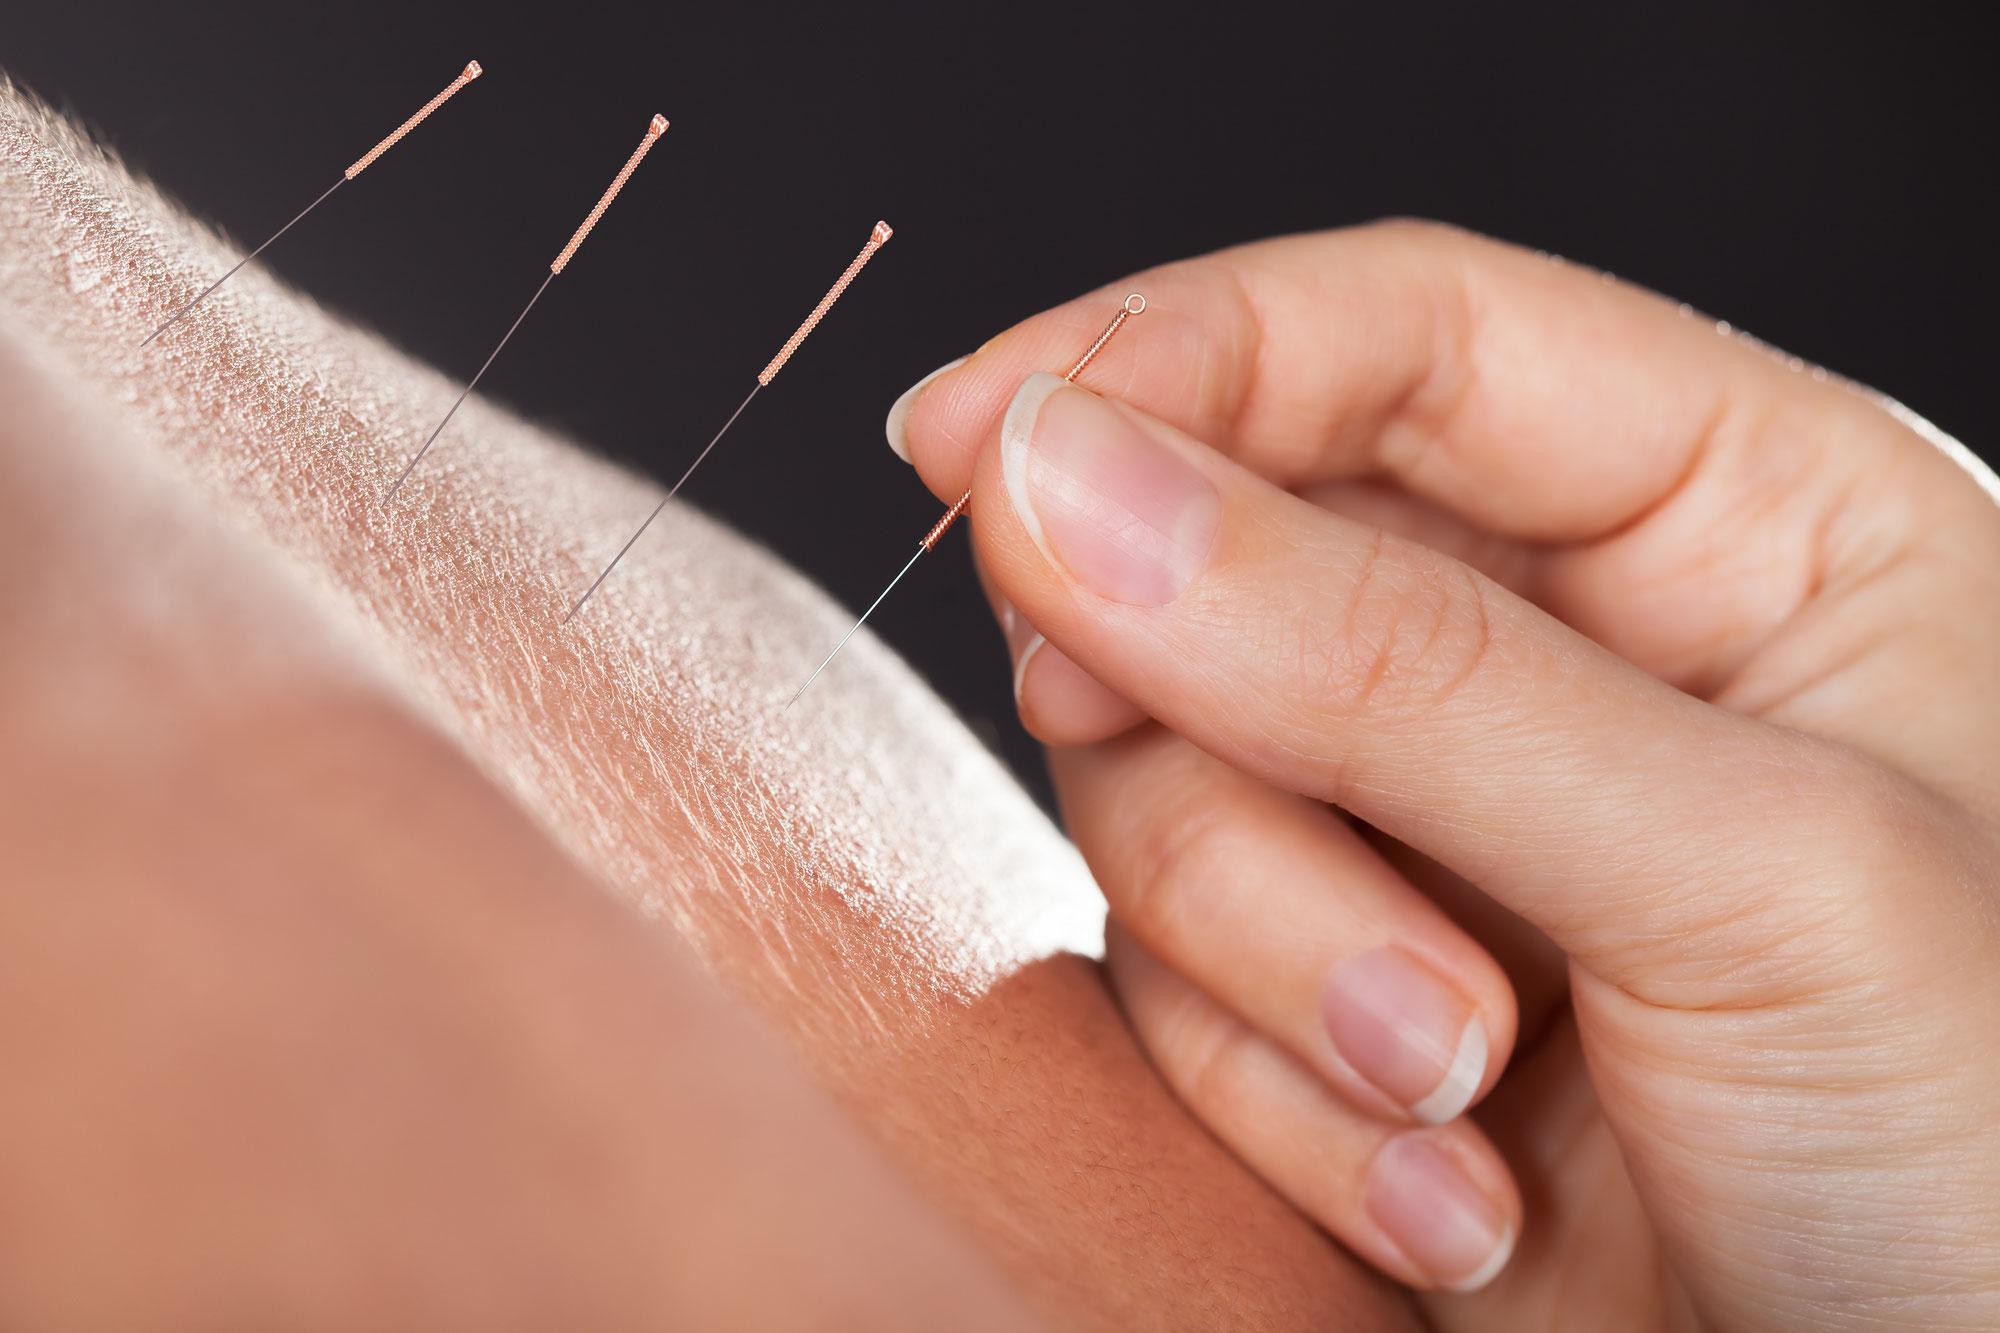 acupunctuur afvallen woerden